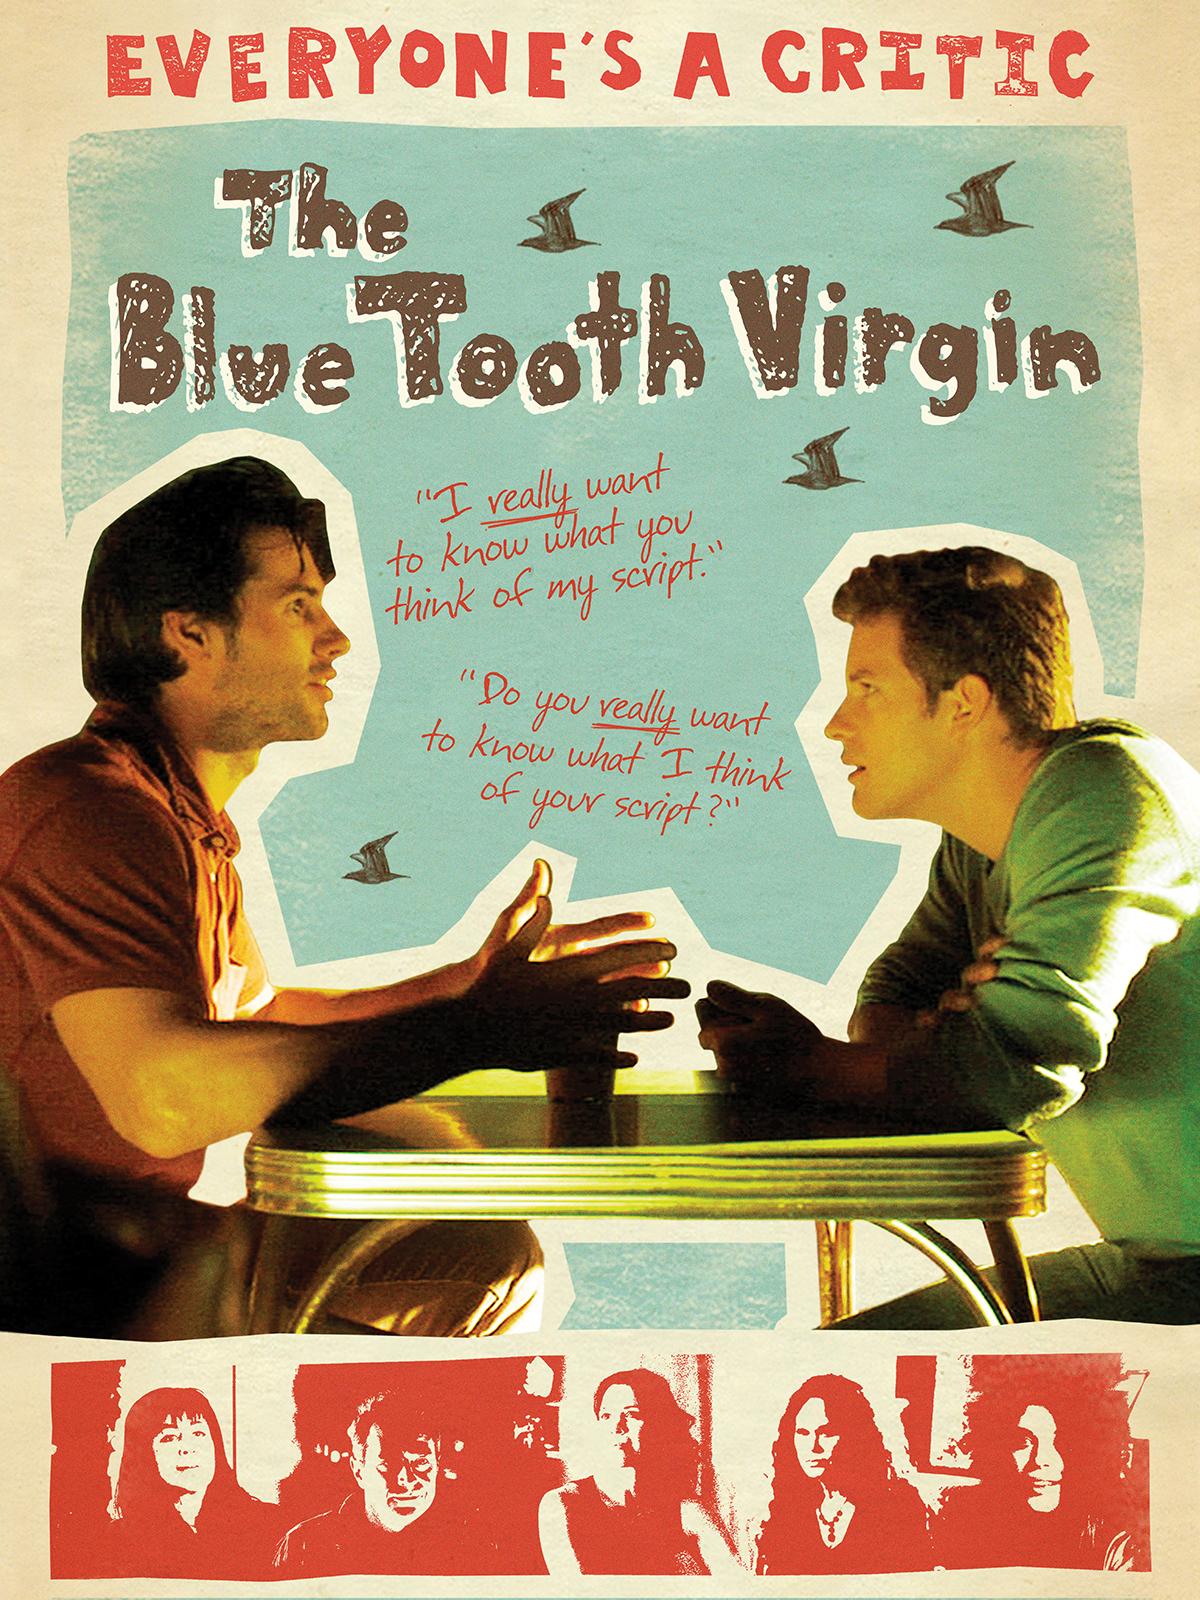 Here-BlueToothVirgin-Full-Image-en-US.jpg